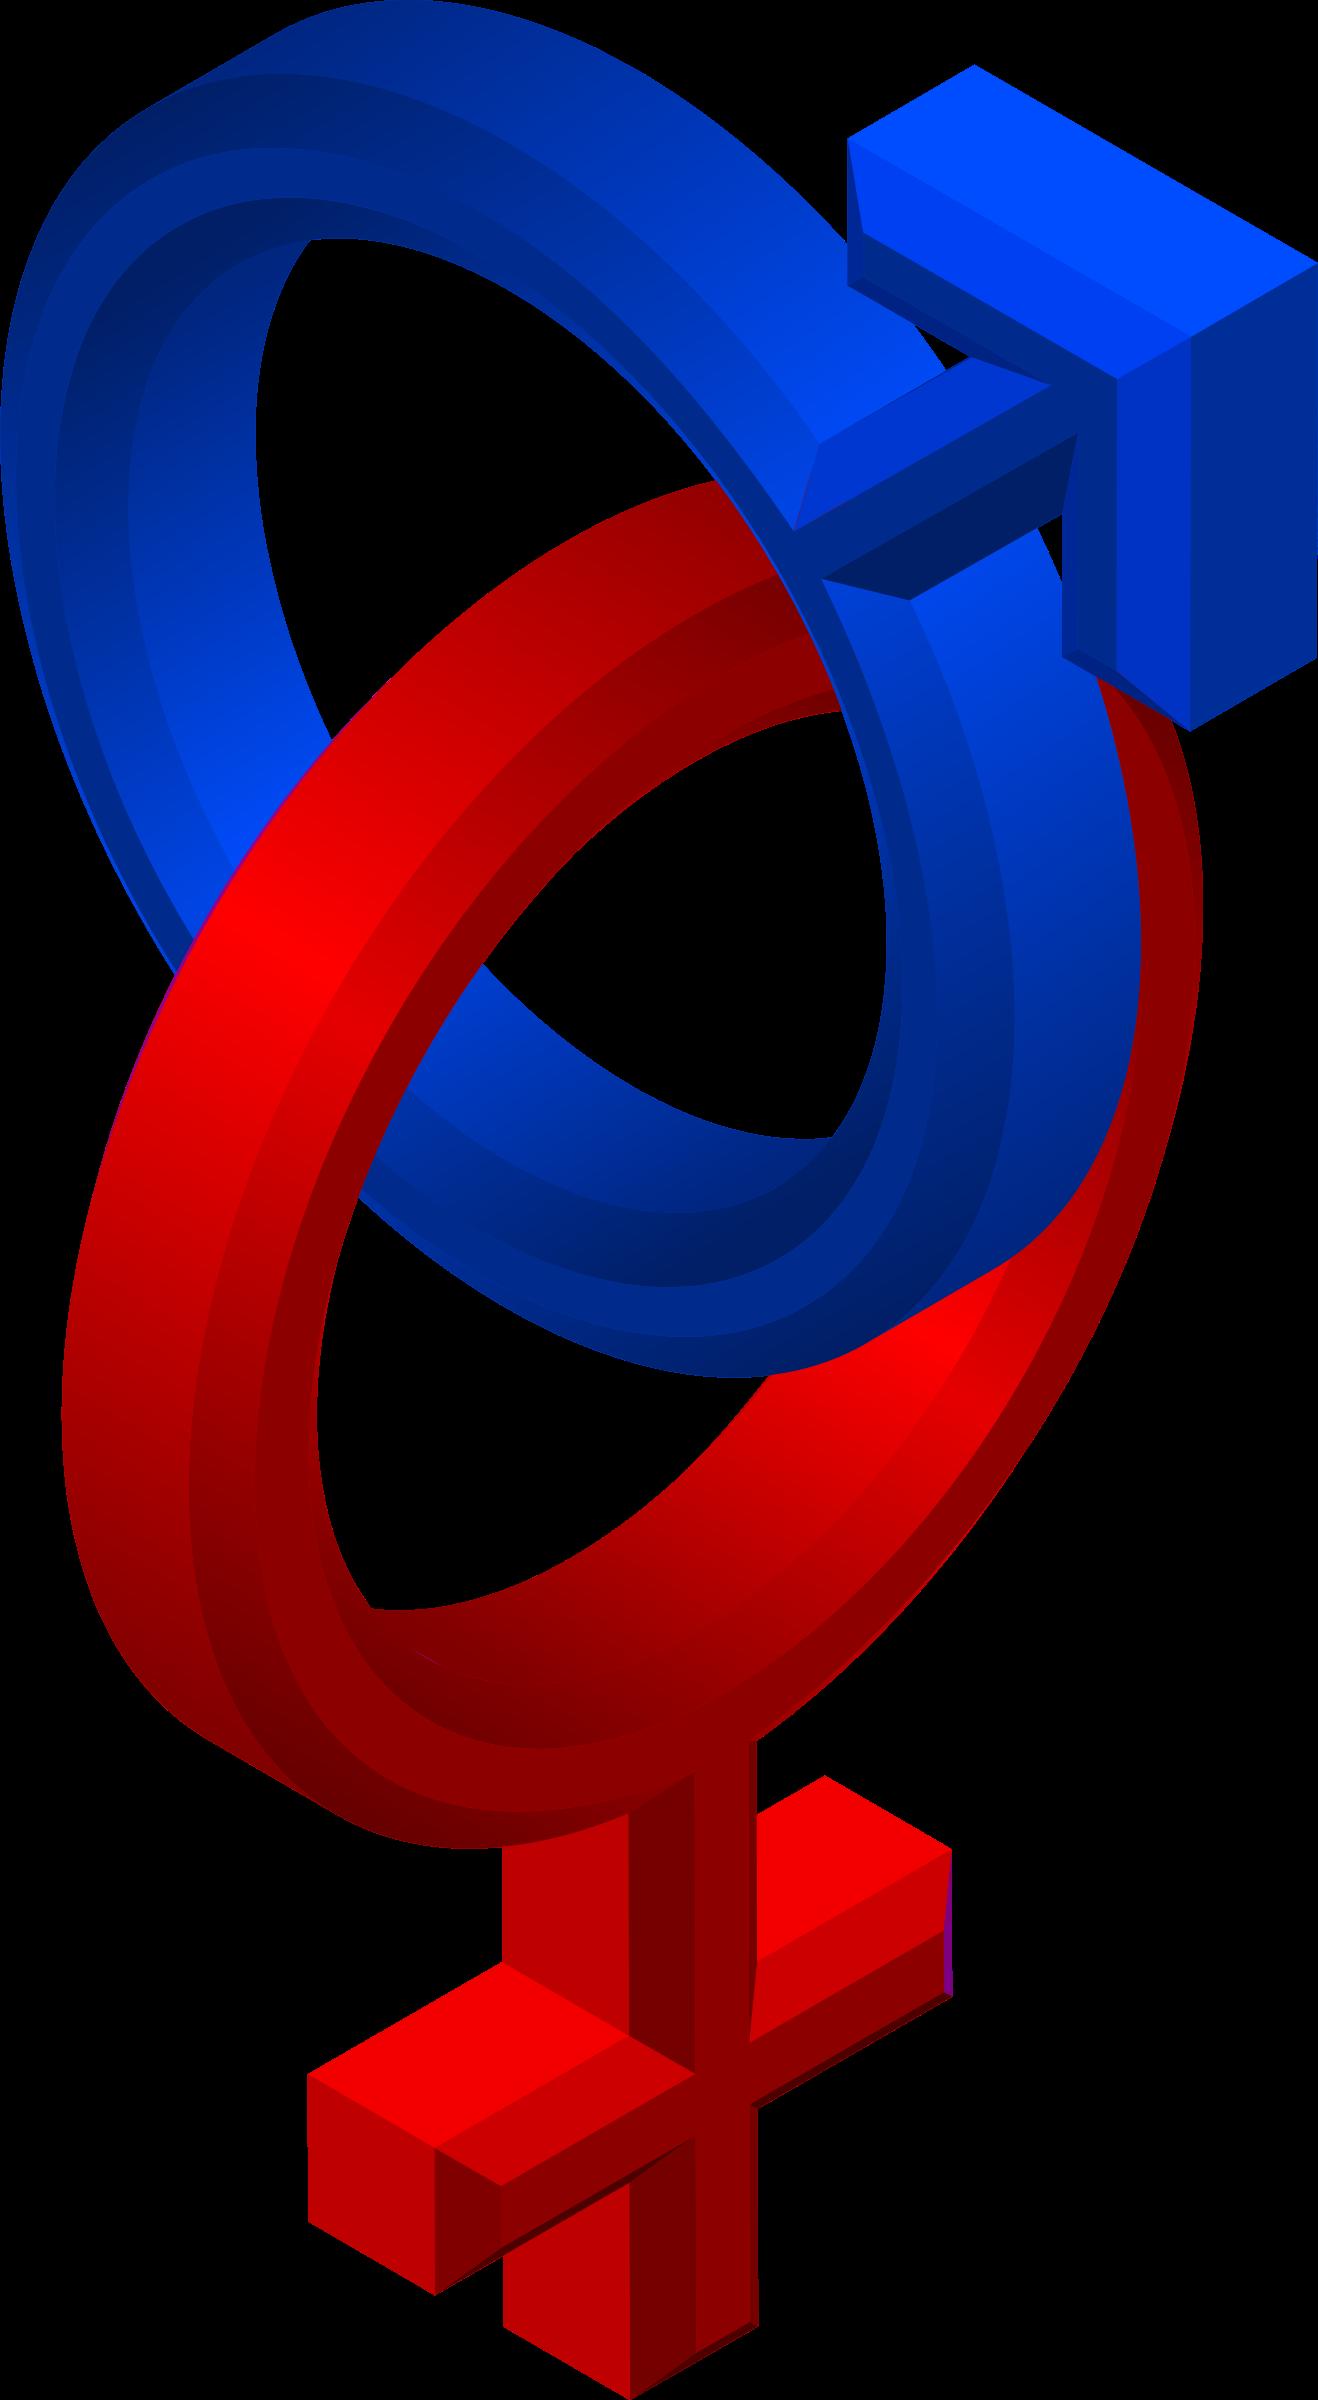 Clipart malefemale symbols malefemale symbols buycottarizona